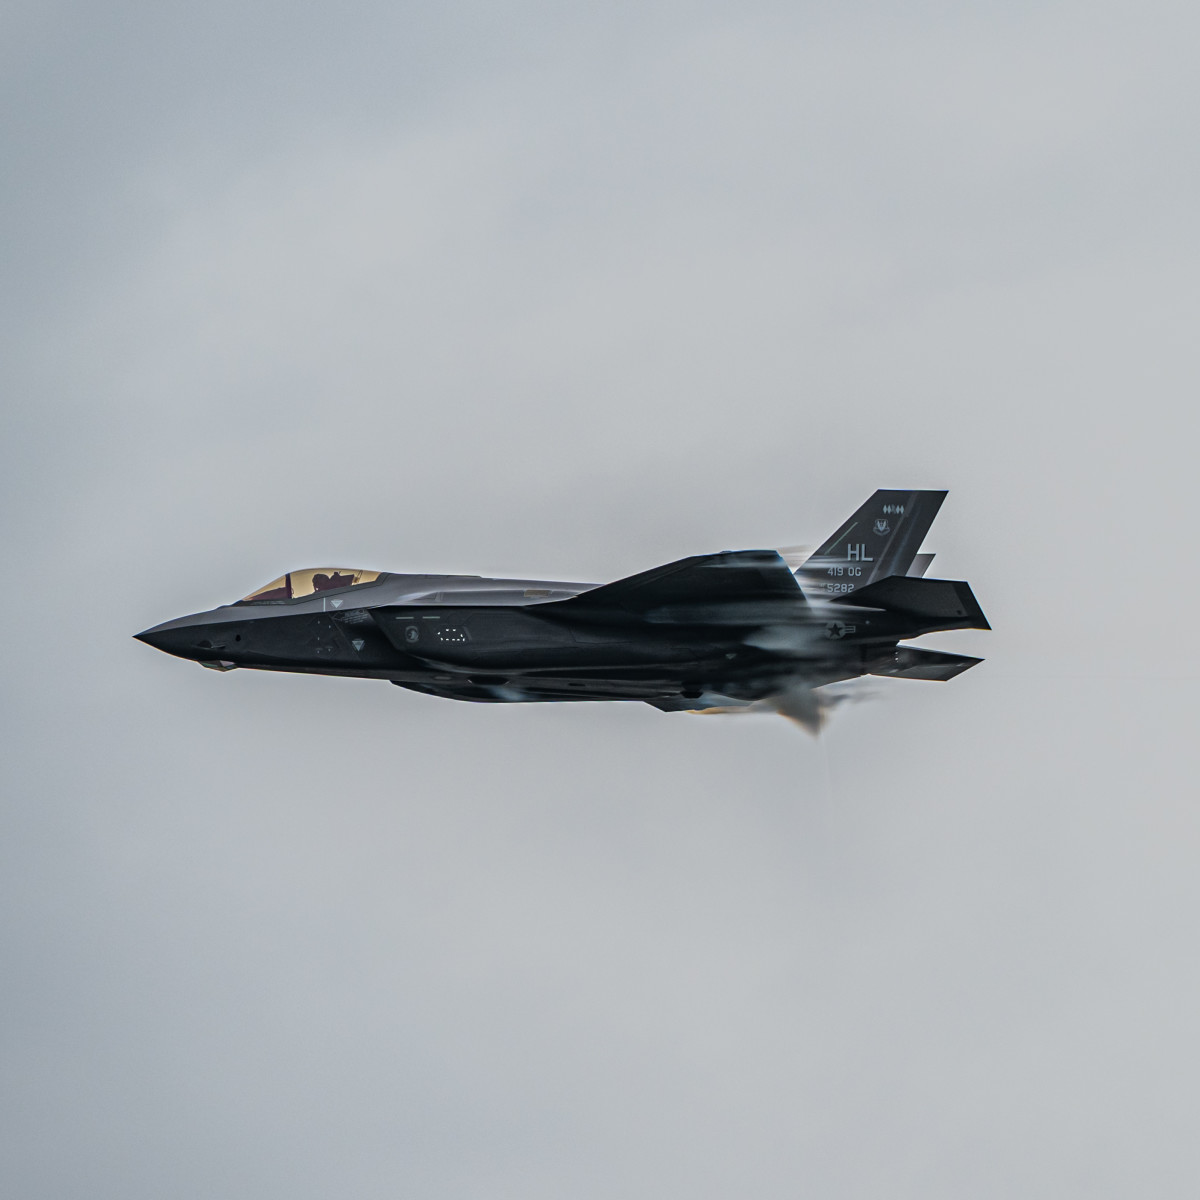 U.S. Air Force F-35